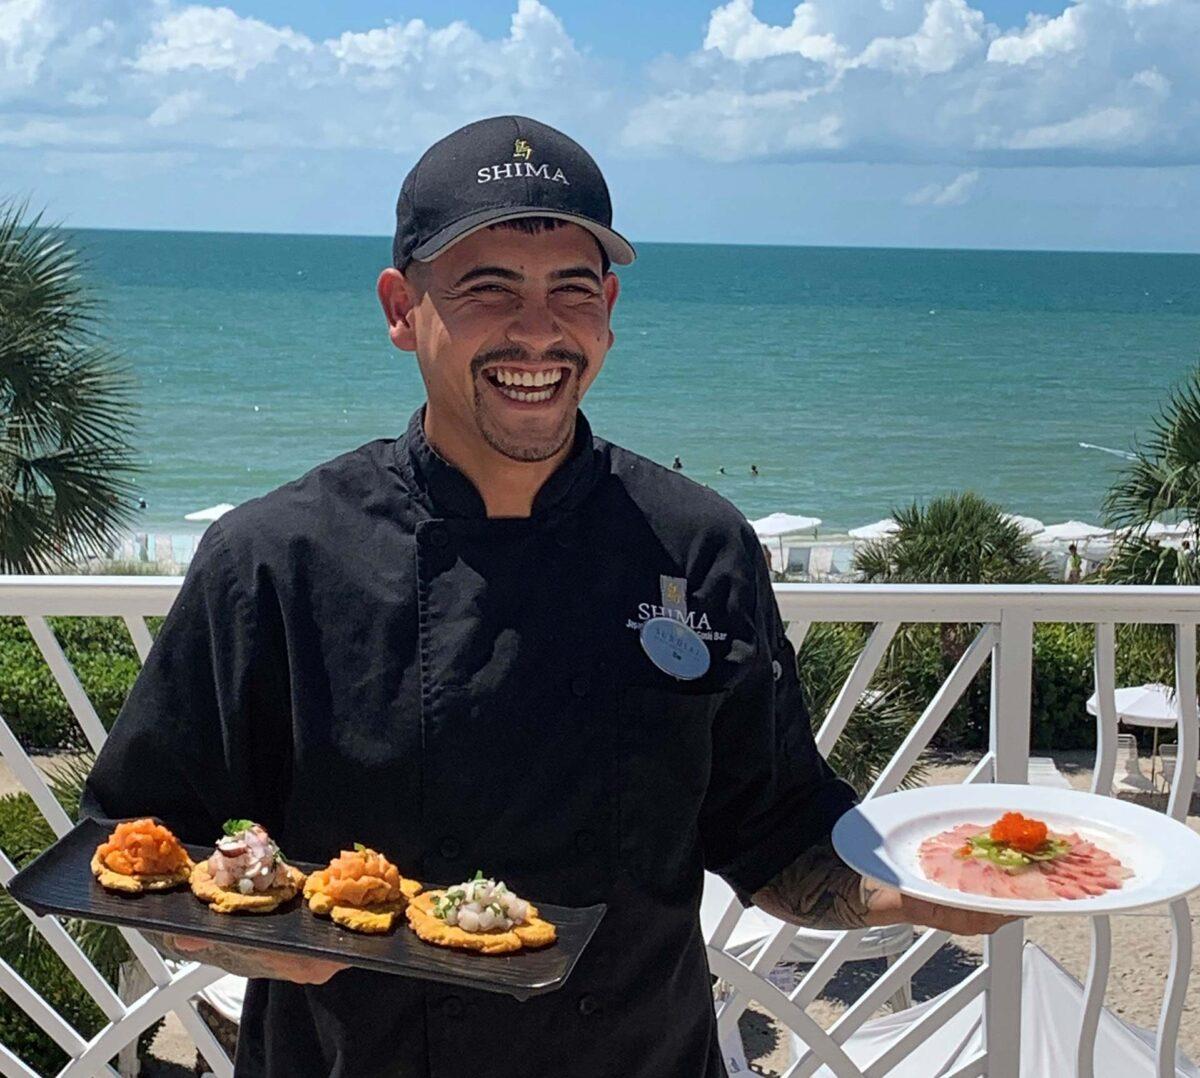 Chef Sai from Shima at the Sundial Resort